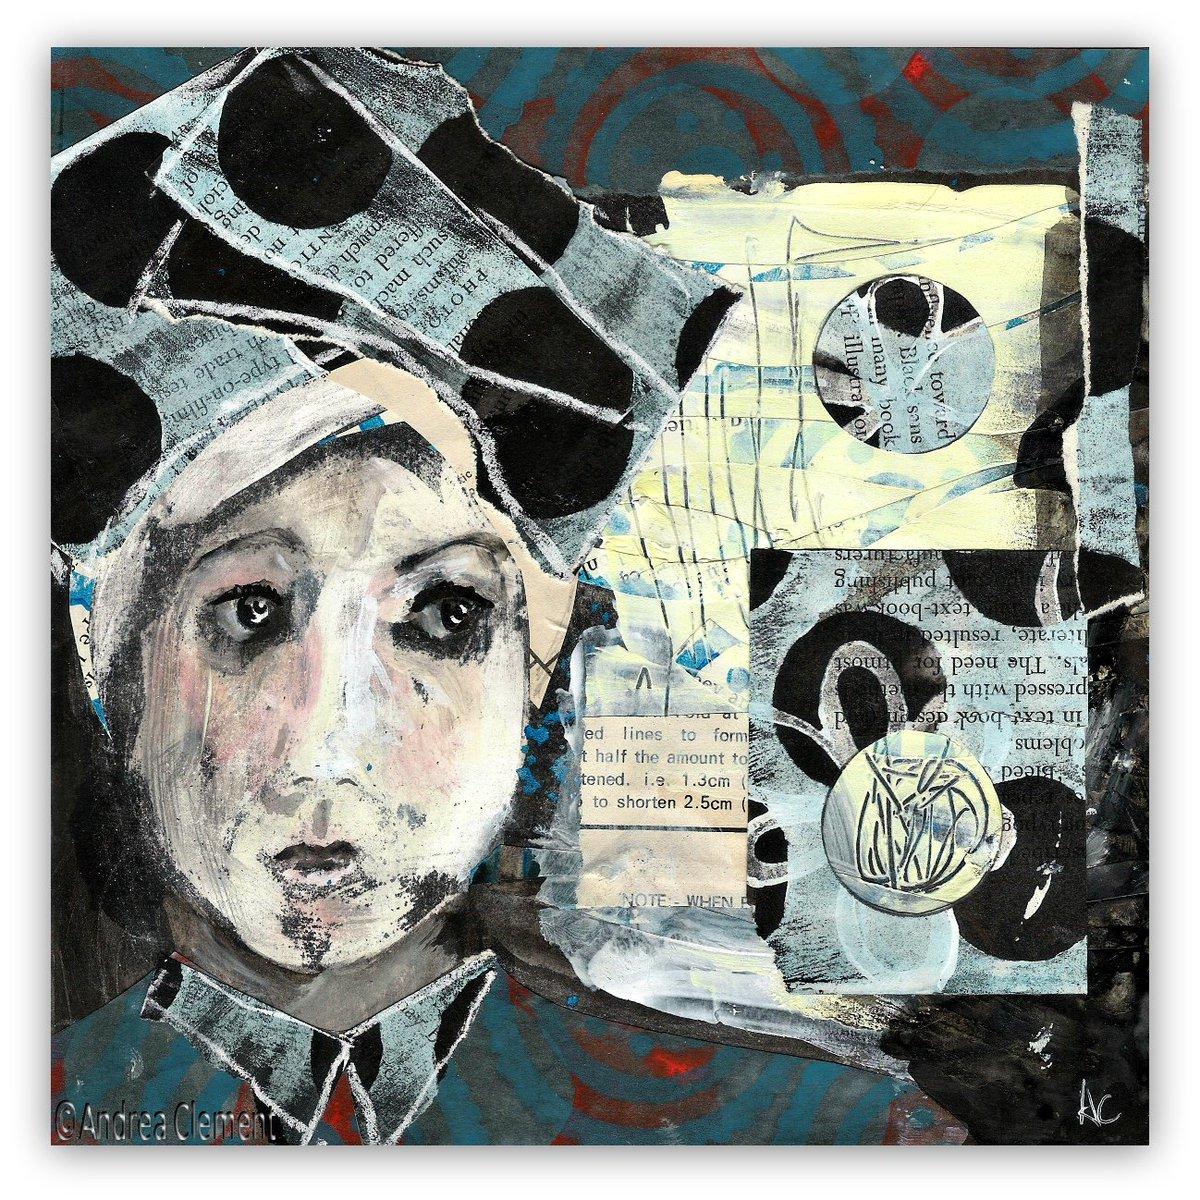 #portraitnovember a little mixed media piece #inkresist #collage #portrait #painting #mixedmediaart #headdress #spots #pattern<br>http://pic.twitter.com/gPT4jbhp9m